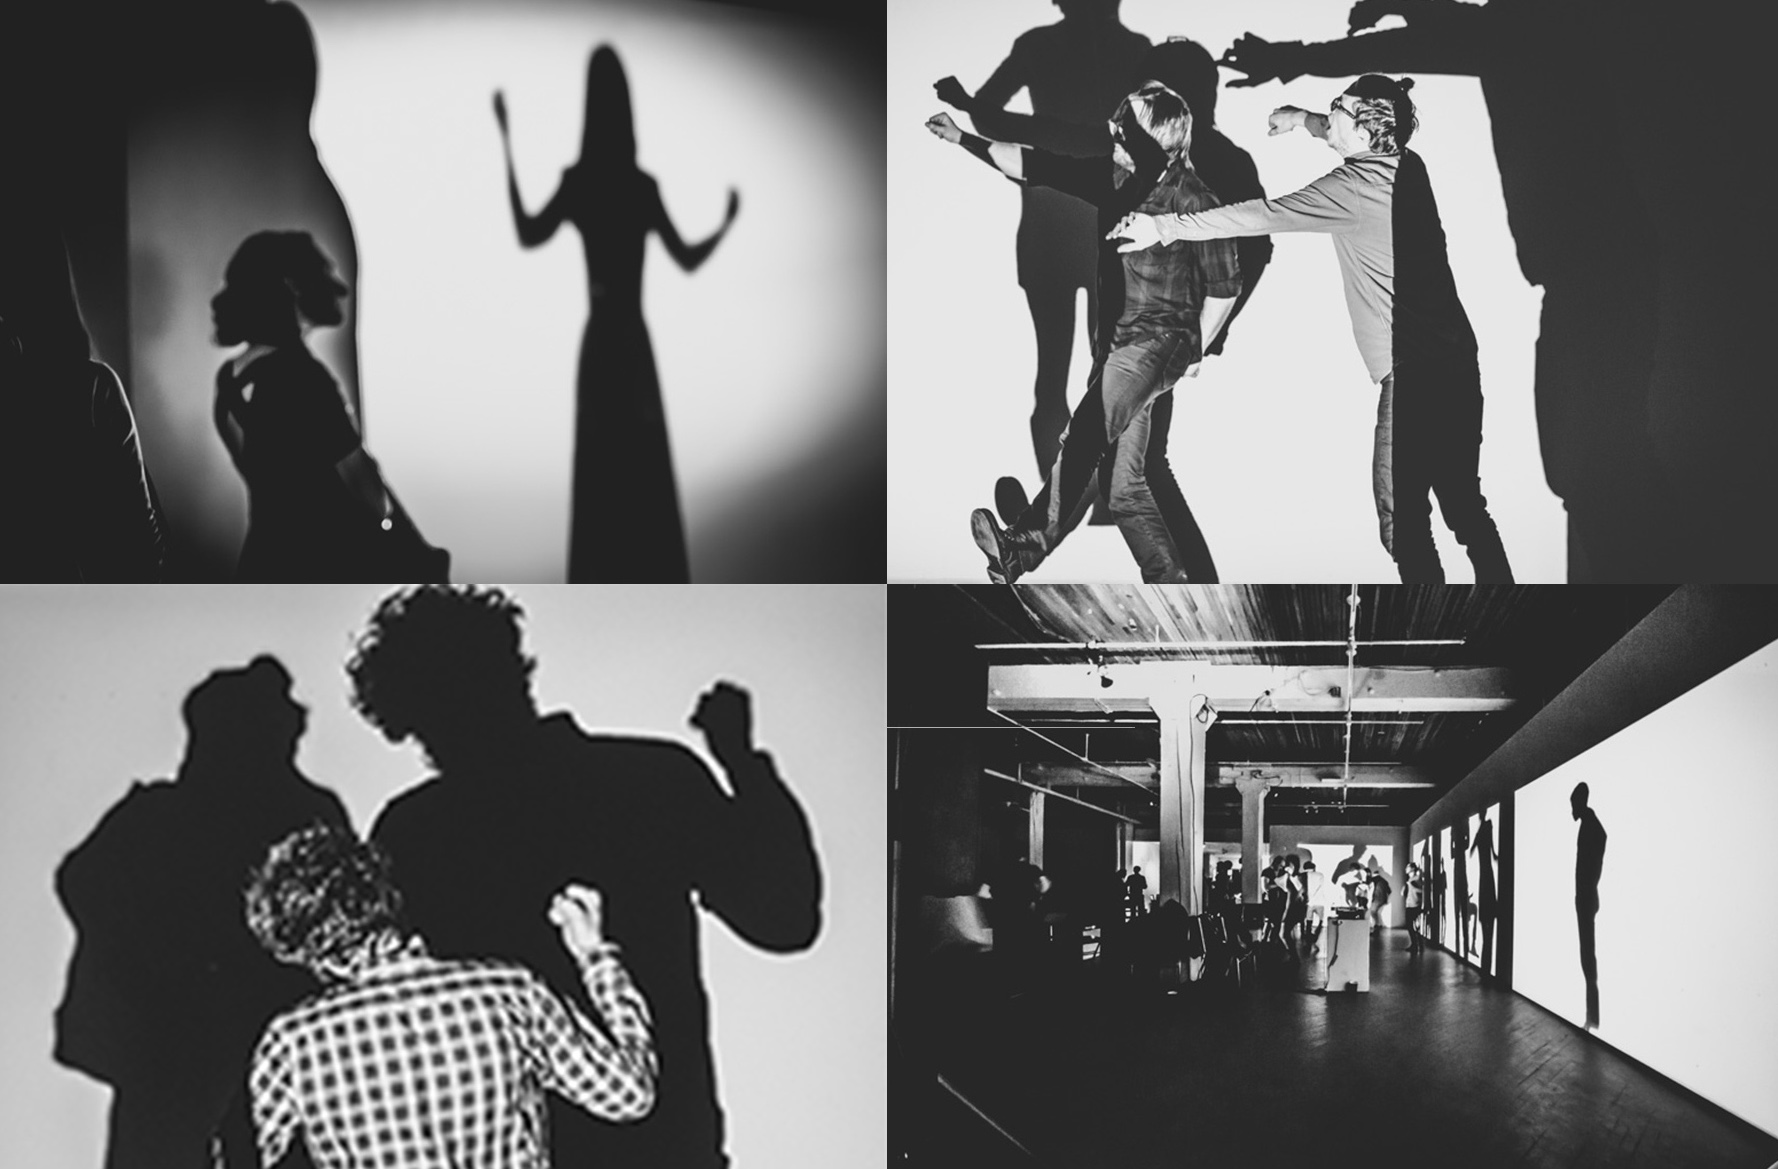 POP + NOISE, video installation, Cluster Festival of New Music + Integrated Arts, 2013. Photos: Pablo Riquelme.